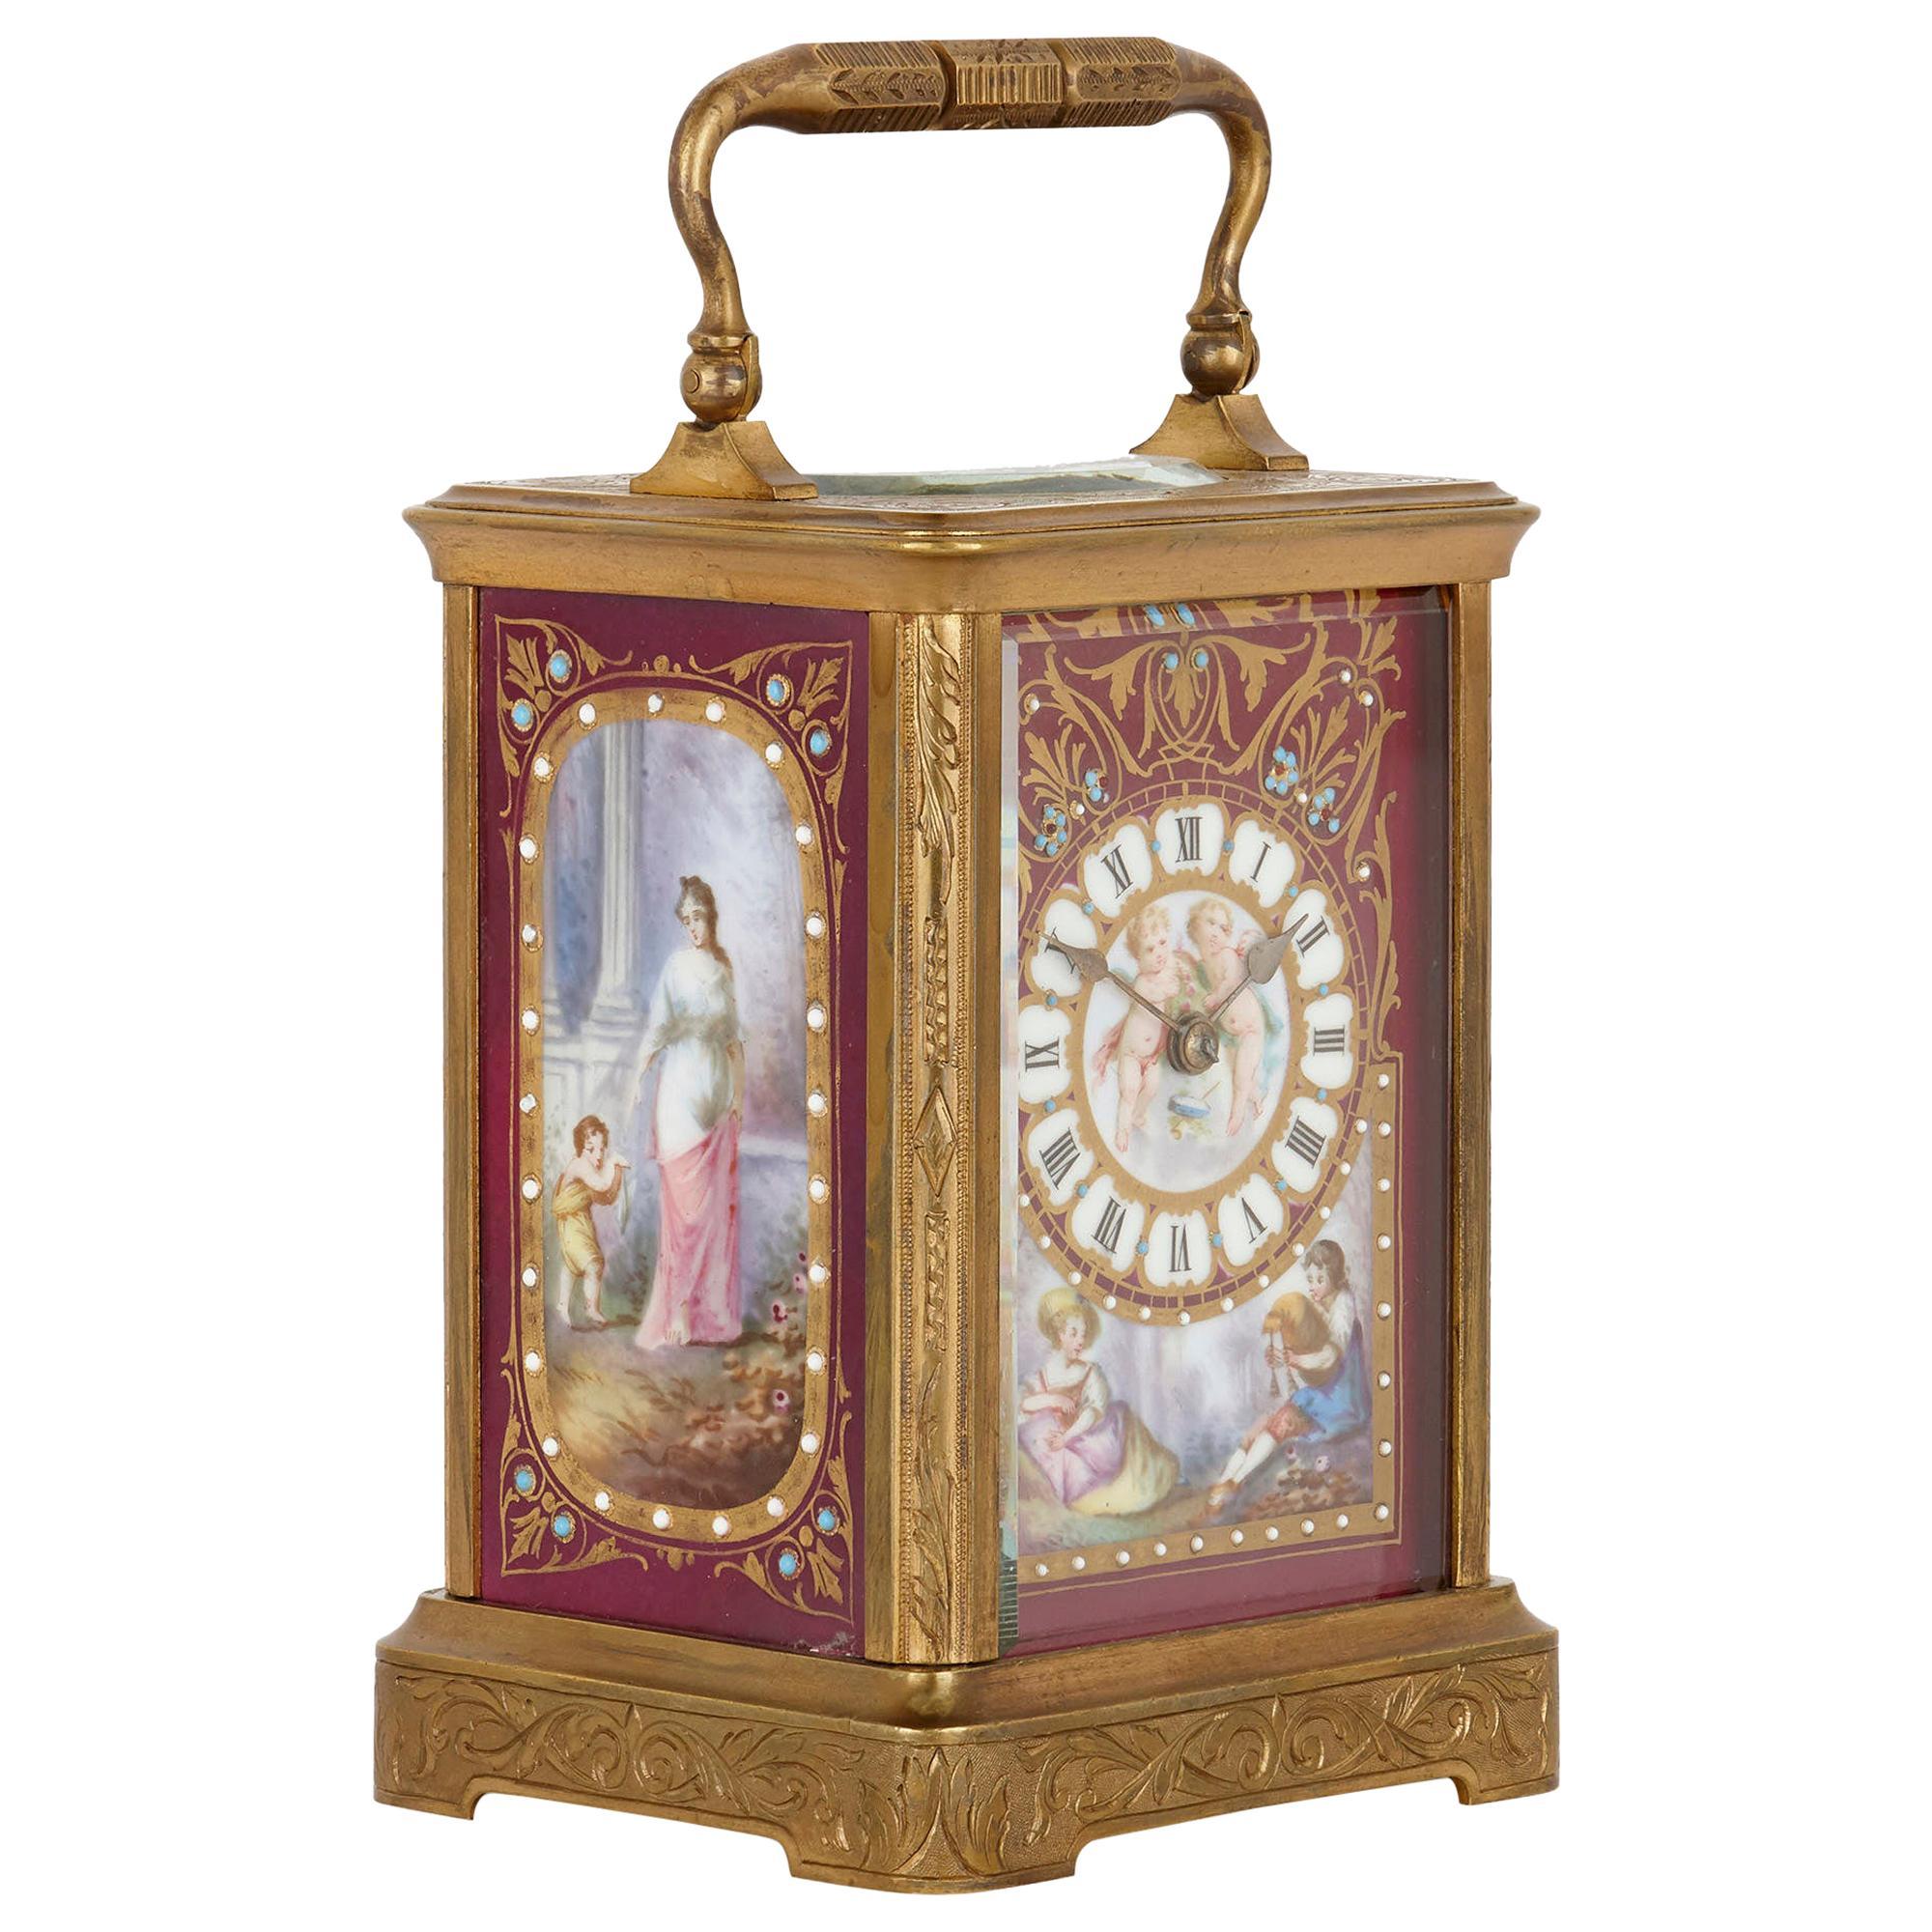 Sèvres Style Gilt Bronze and Porcelain Carriage Clock